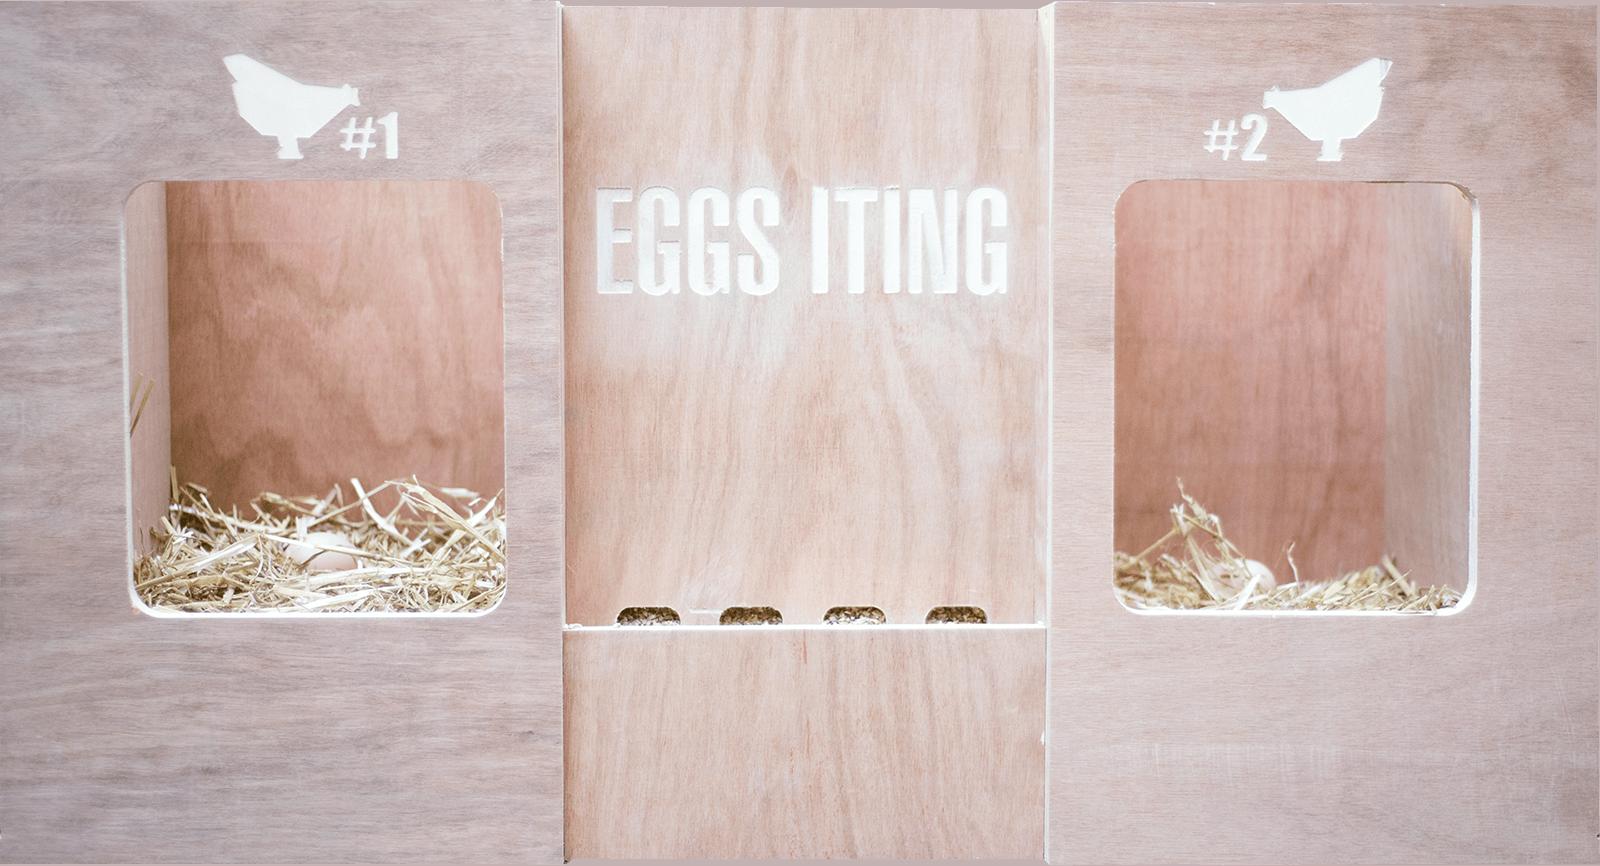 Prototype du nid eggs iting